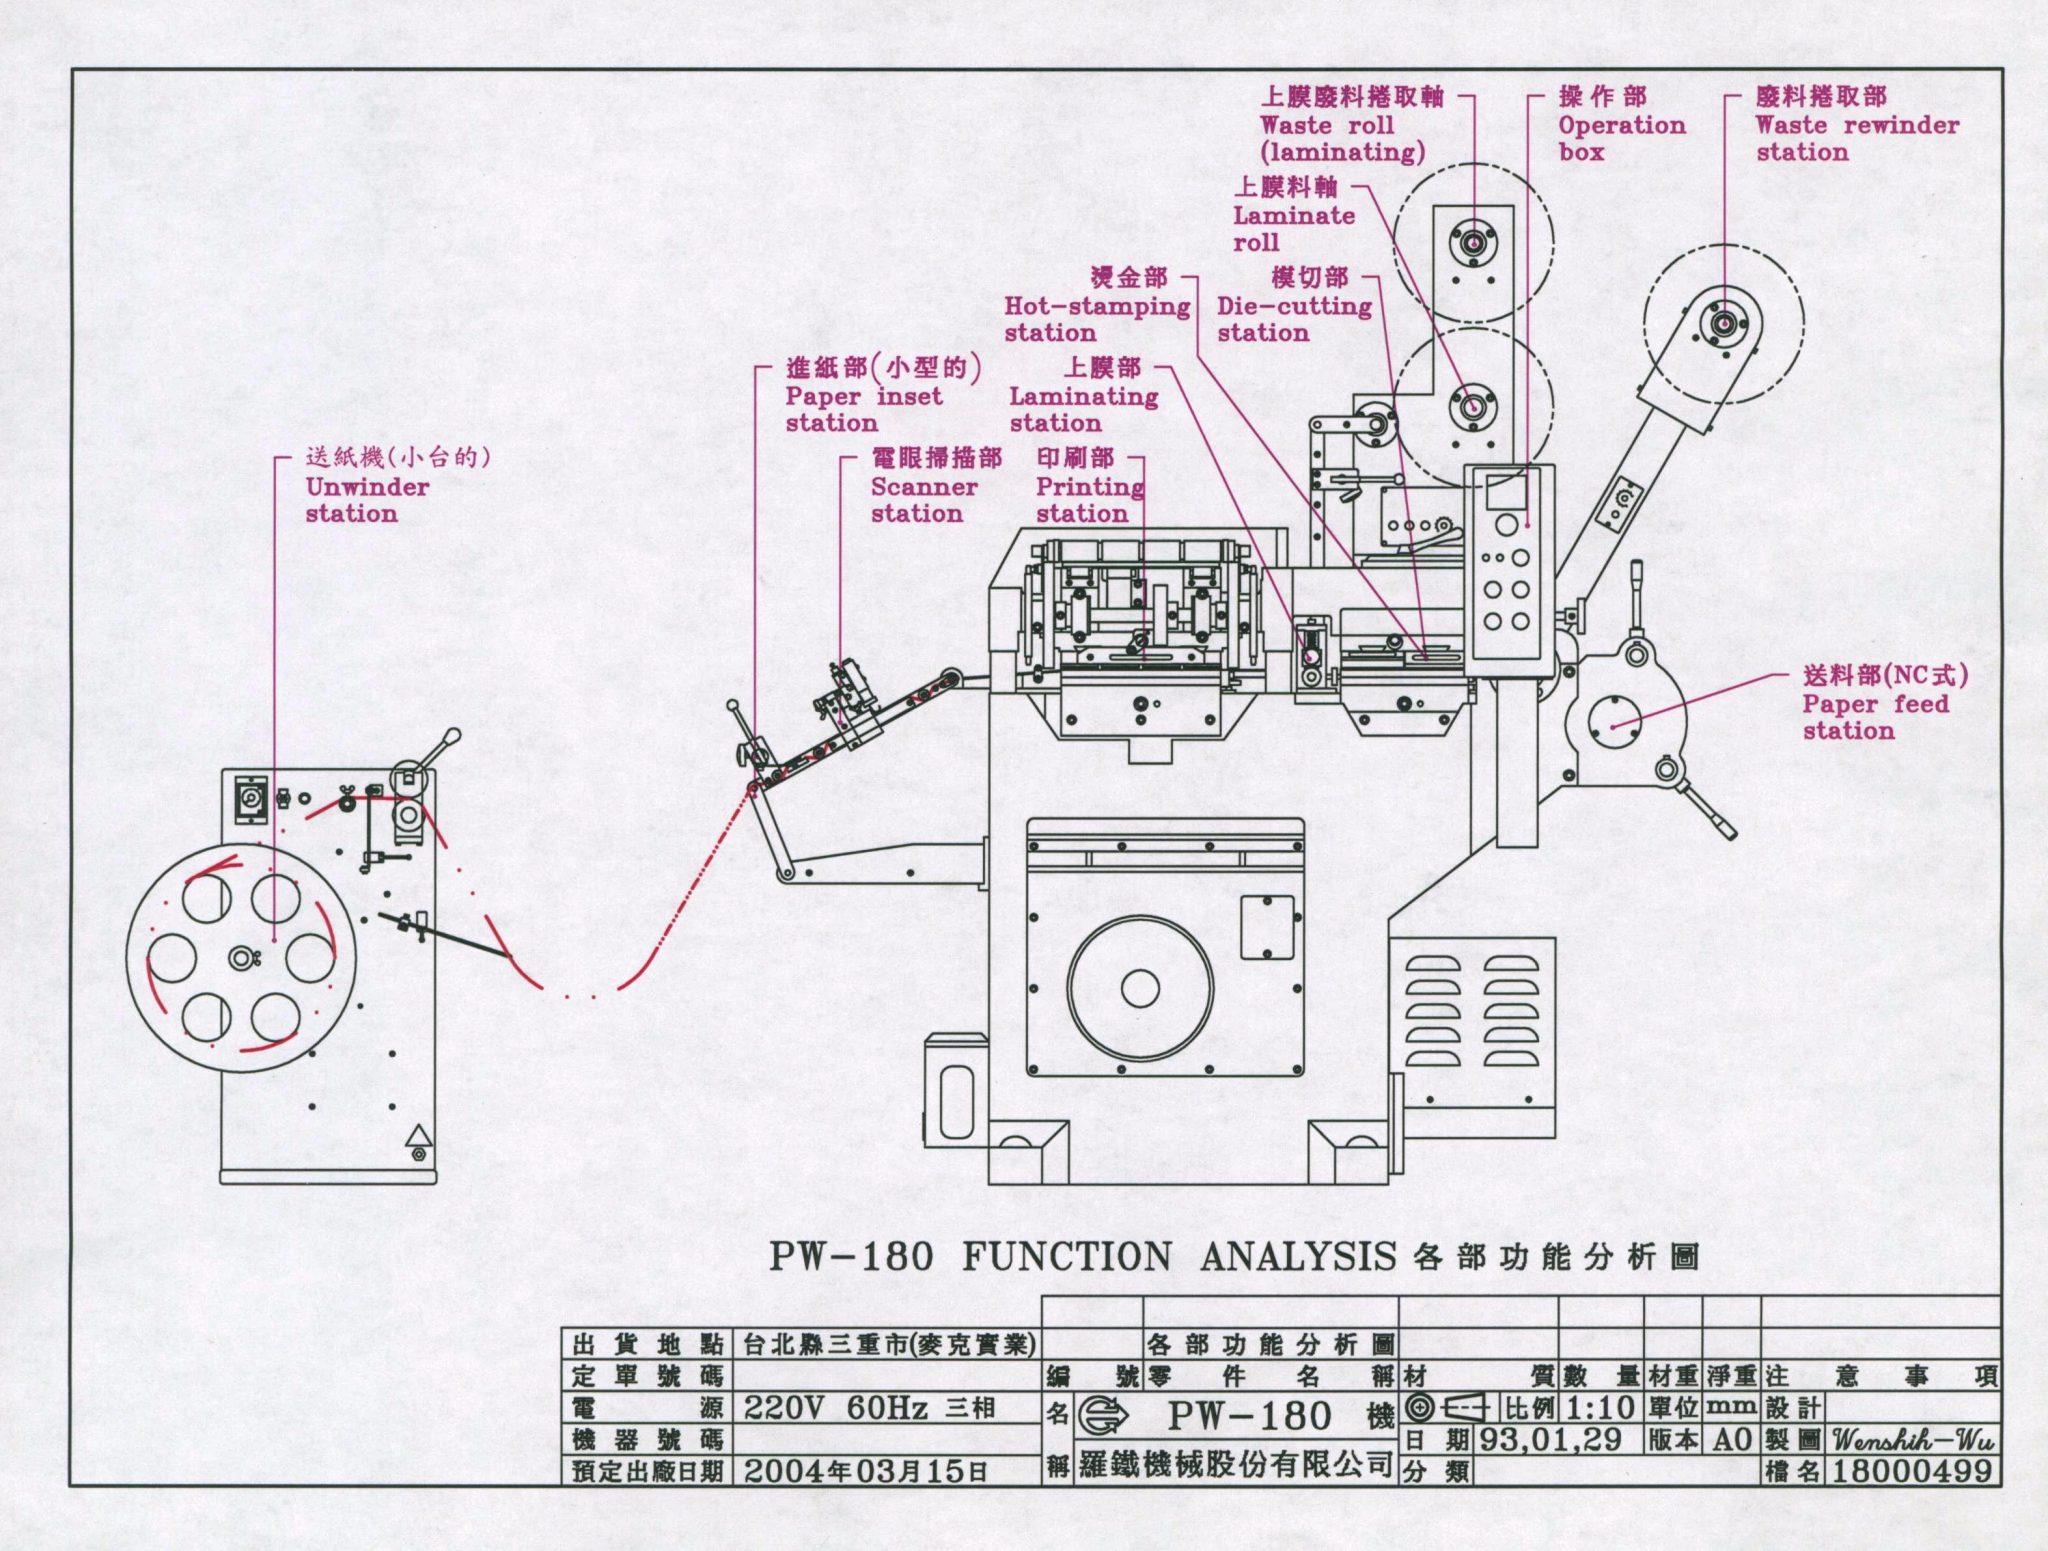 PWS 310 / 450 / 550 CNC seriesSILK SCREEN PRINTING MACHINE PNEUMATIC PRINTING HEAD